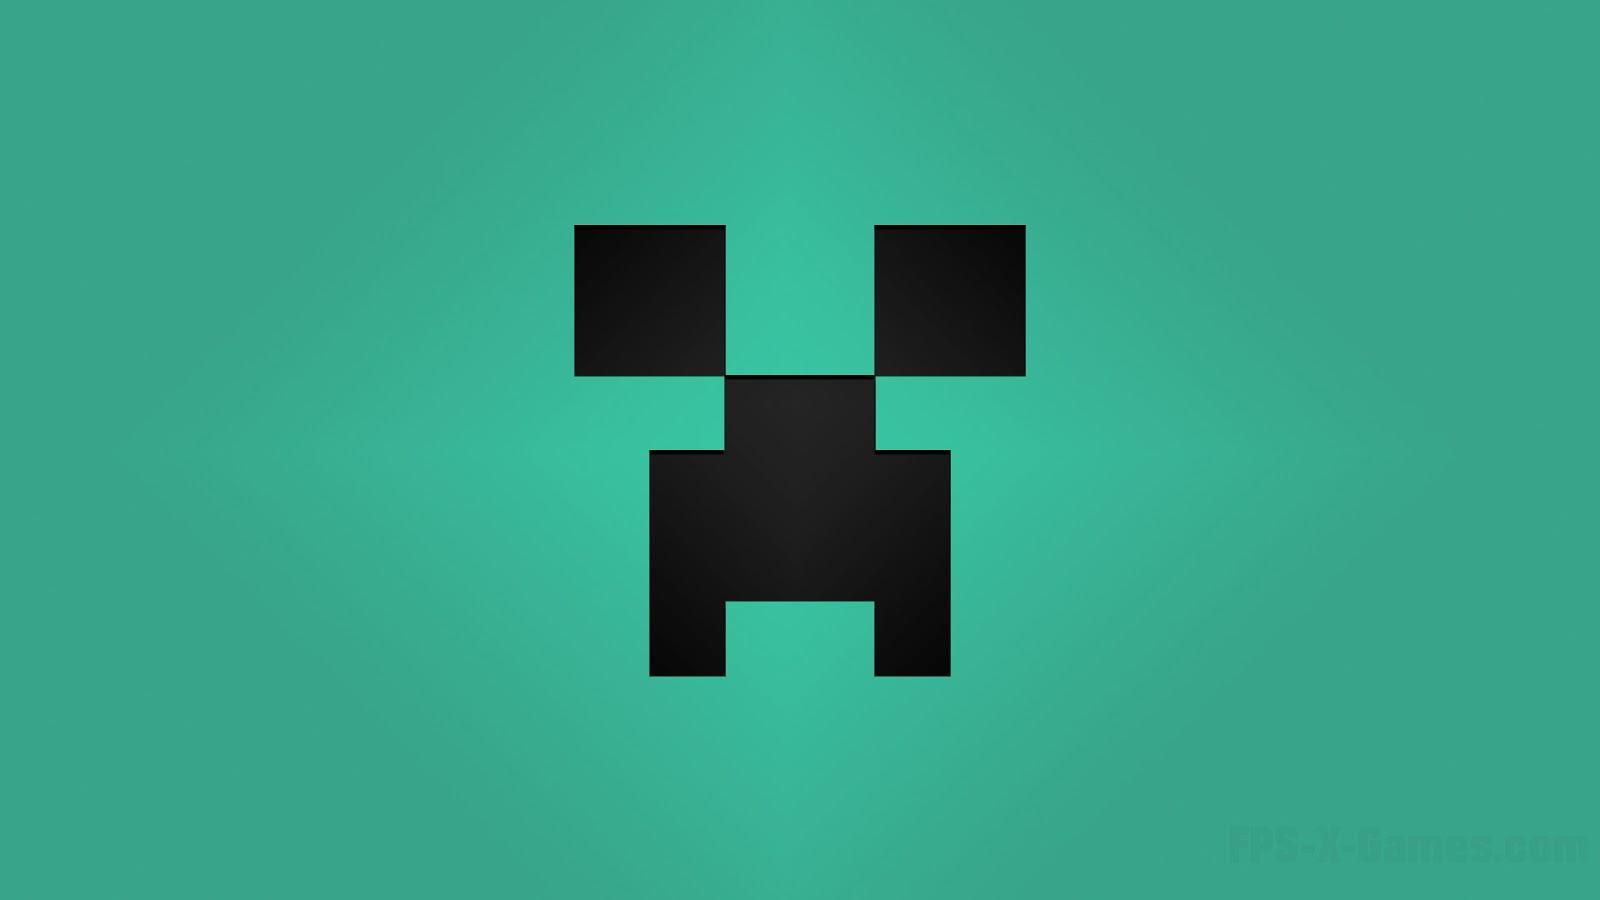 Minecraft Creeper desktop wallpapers cyan